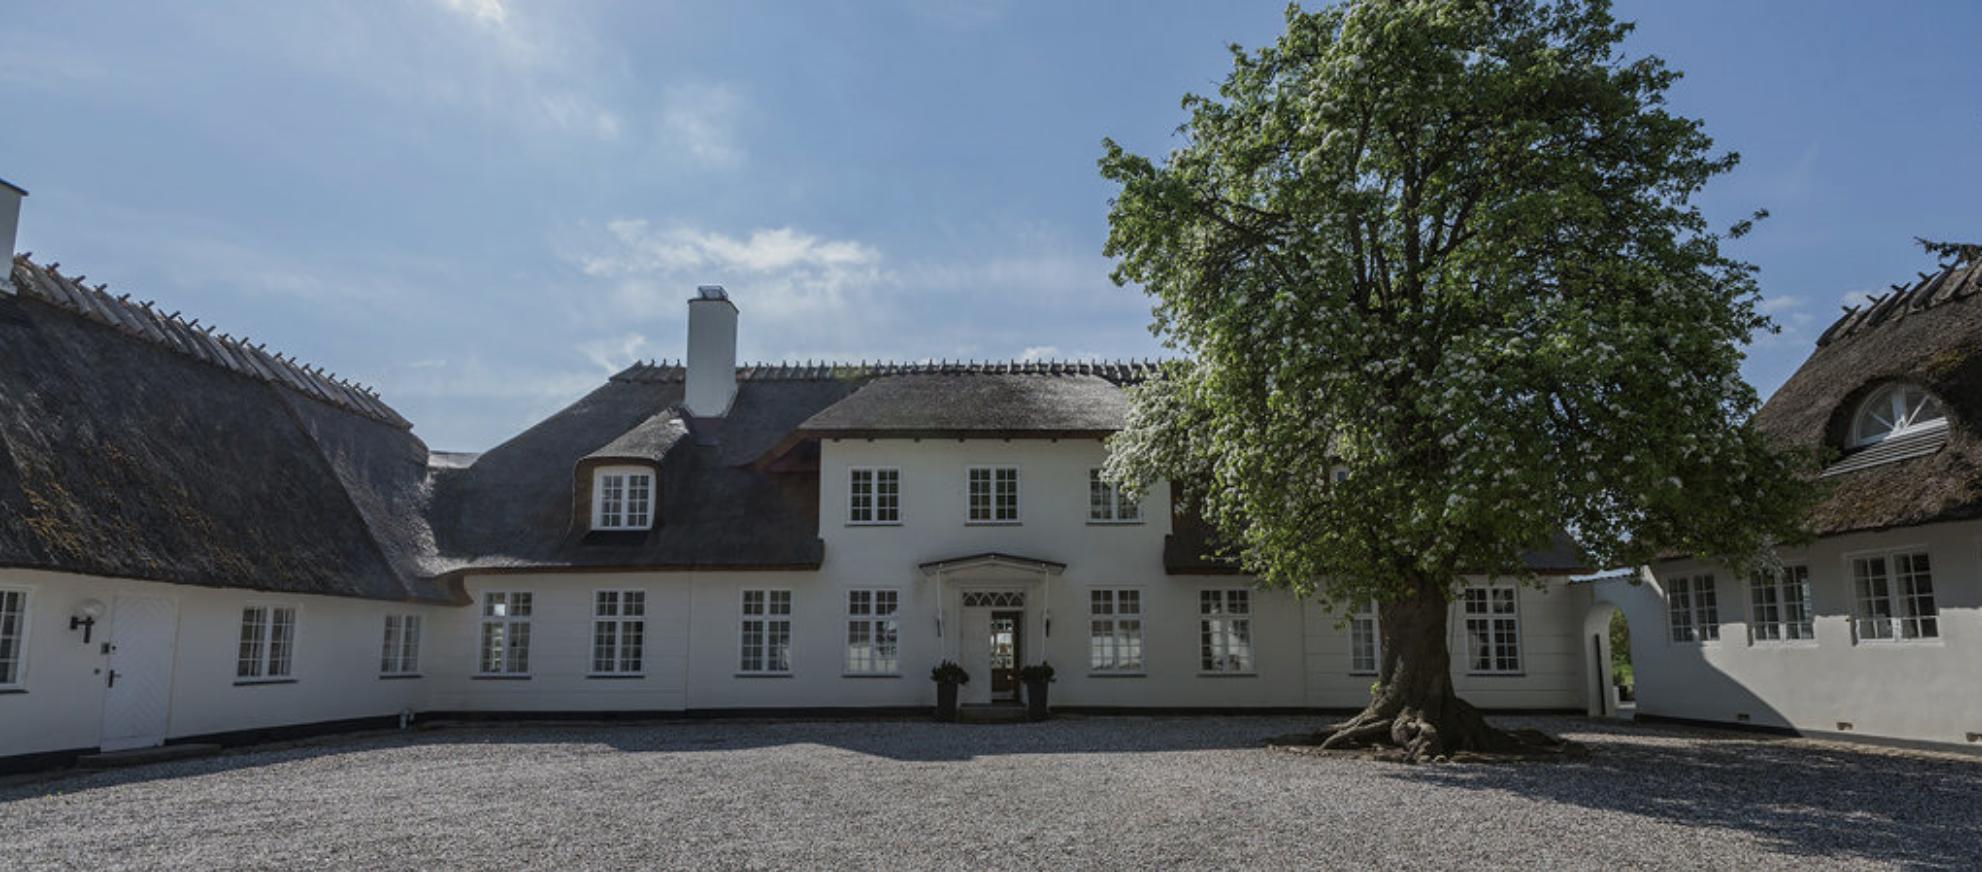 Saga Furs International Design Centre - Vedbæk, Denmark